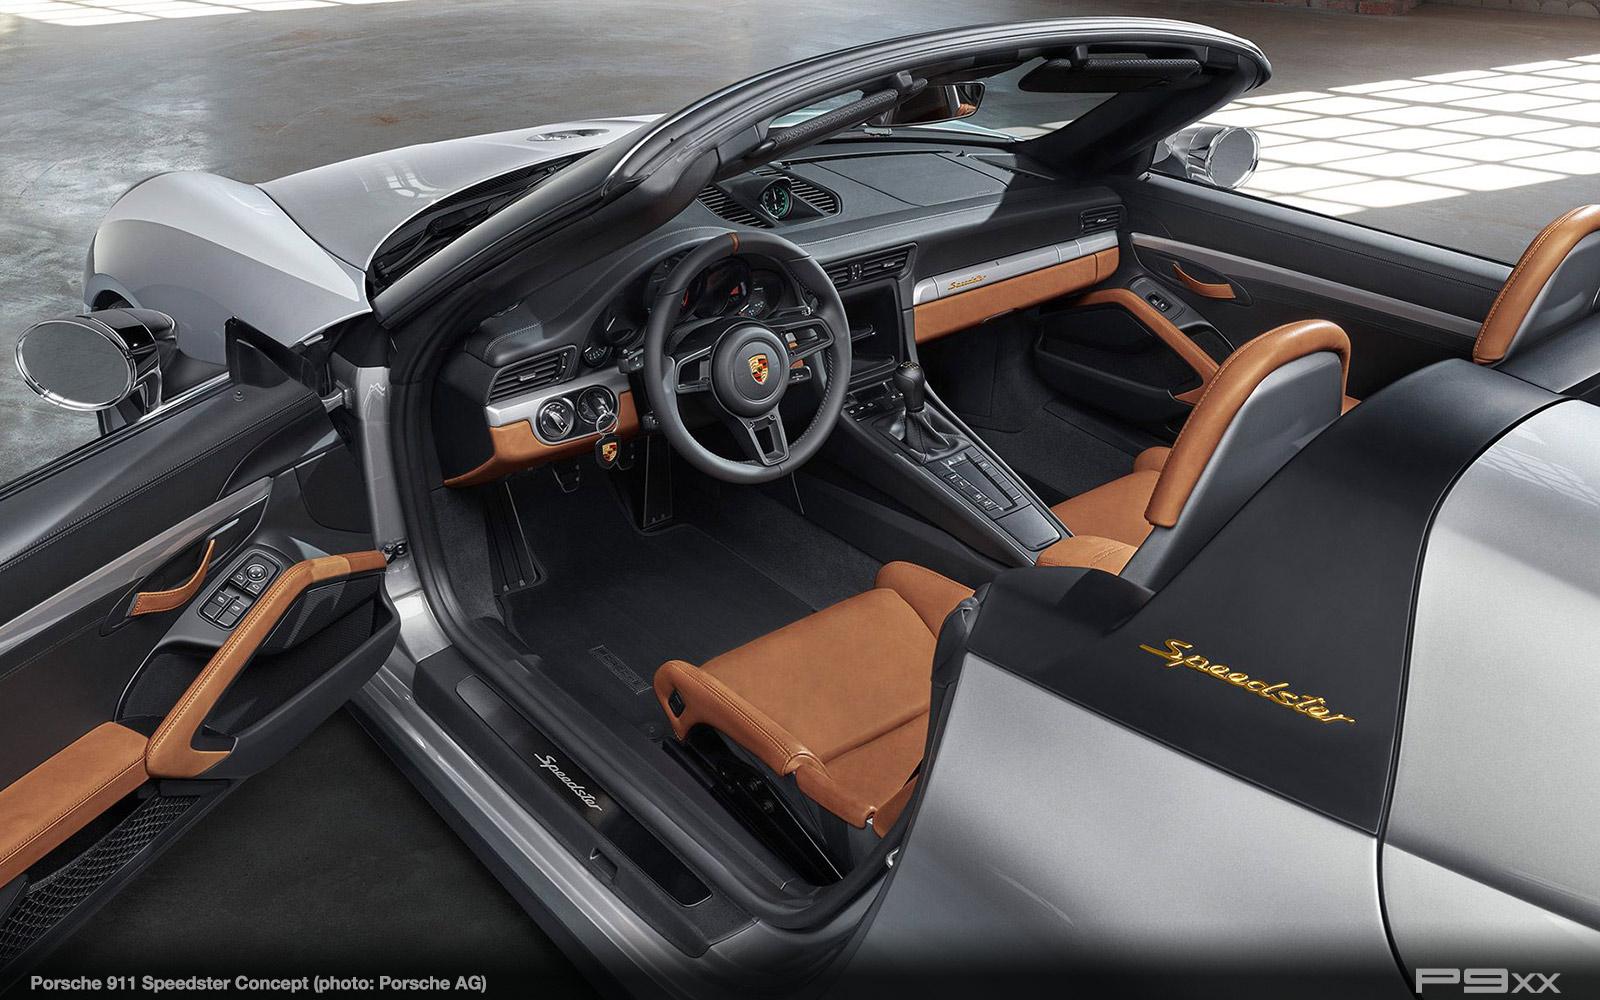 Porsche-911-Speedster-Concept-2018-296